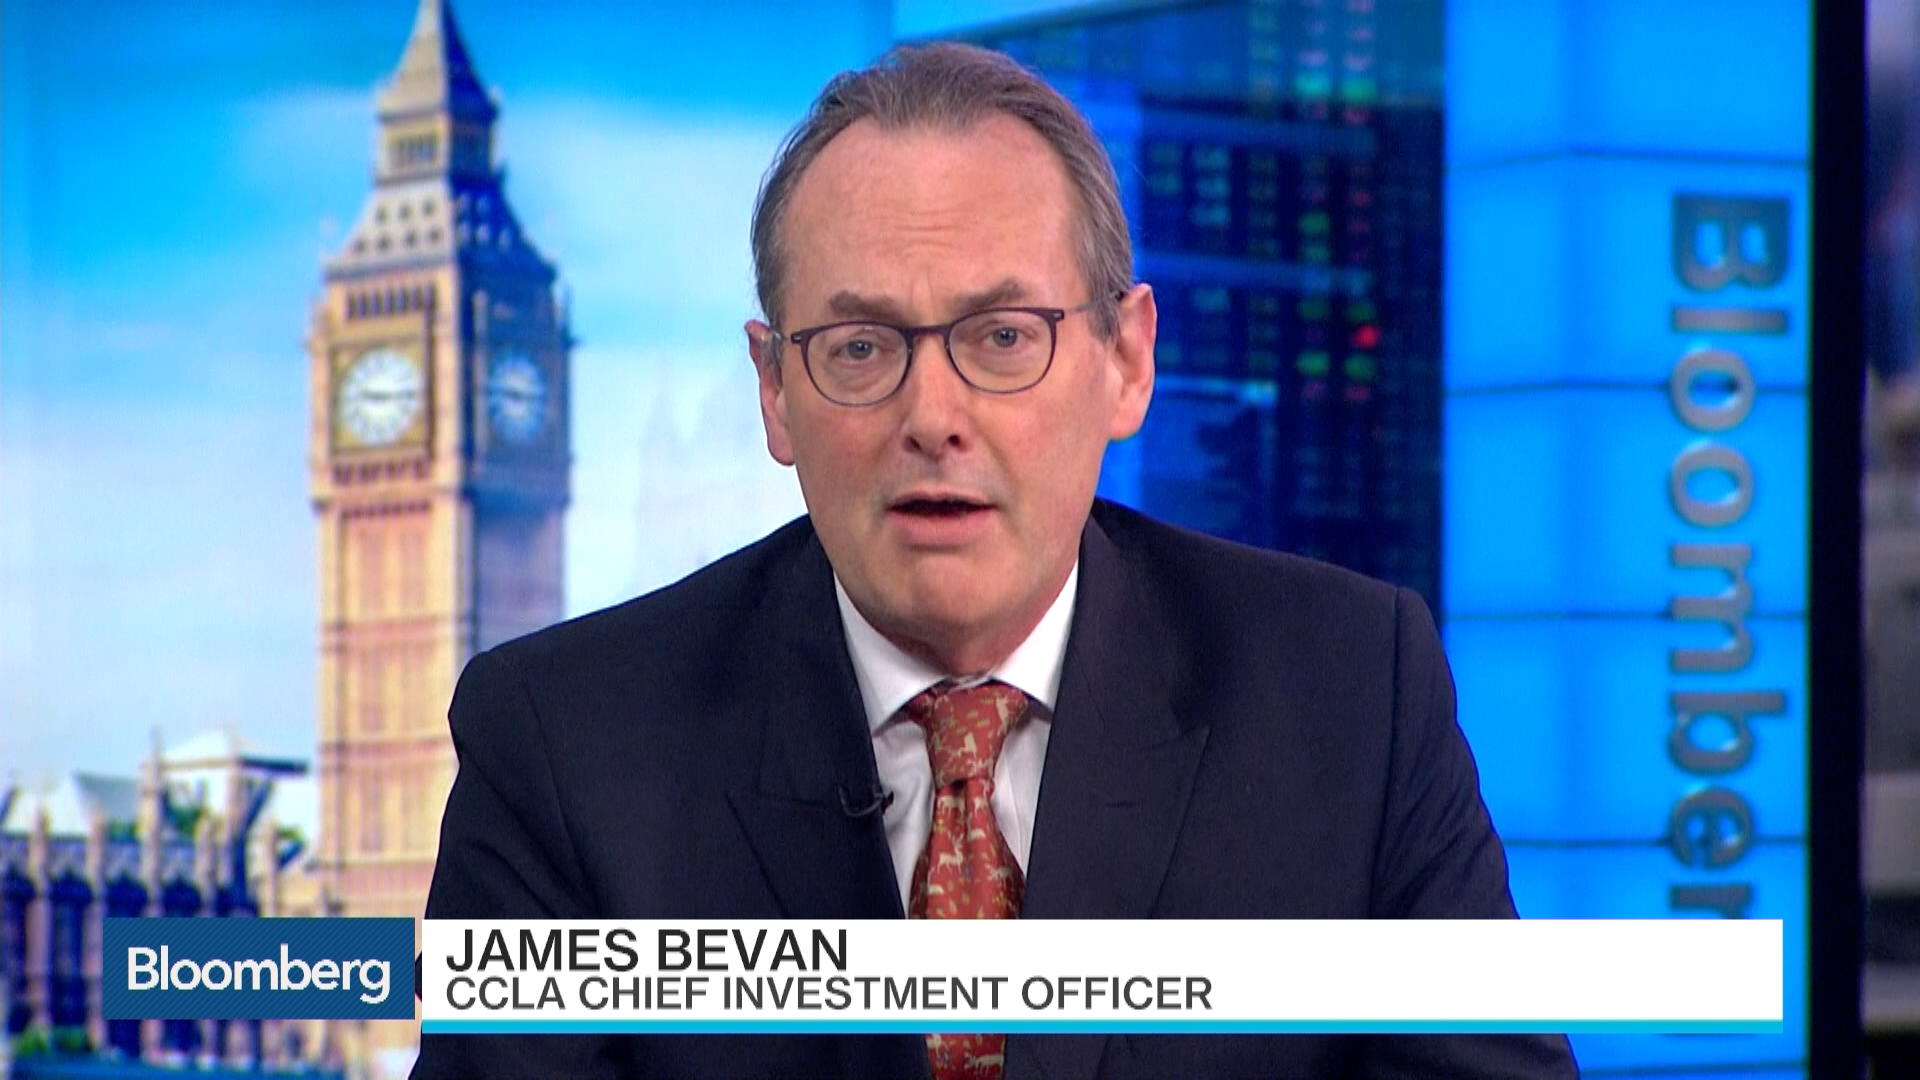 Boeing deepens jetliner job cuts as risk of sales downturn looms bloomberg - Boeing Deepens Jetliner Job Cuts As Risk Of Sales Downturn Looms Bloomberg 37